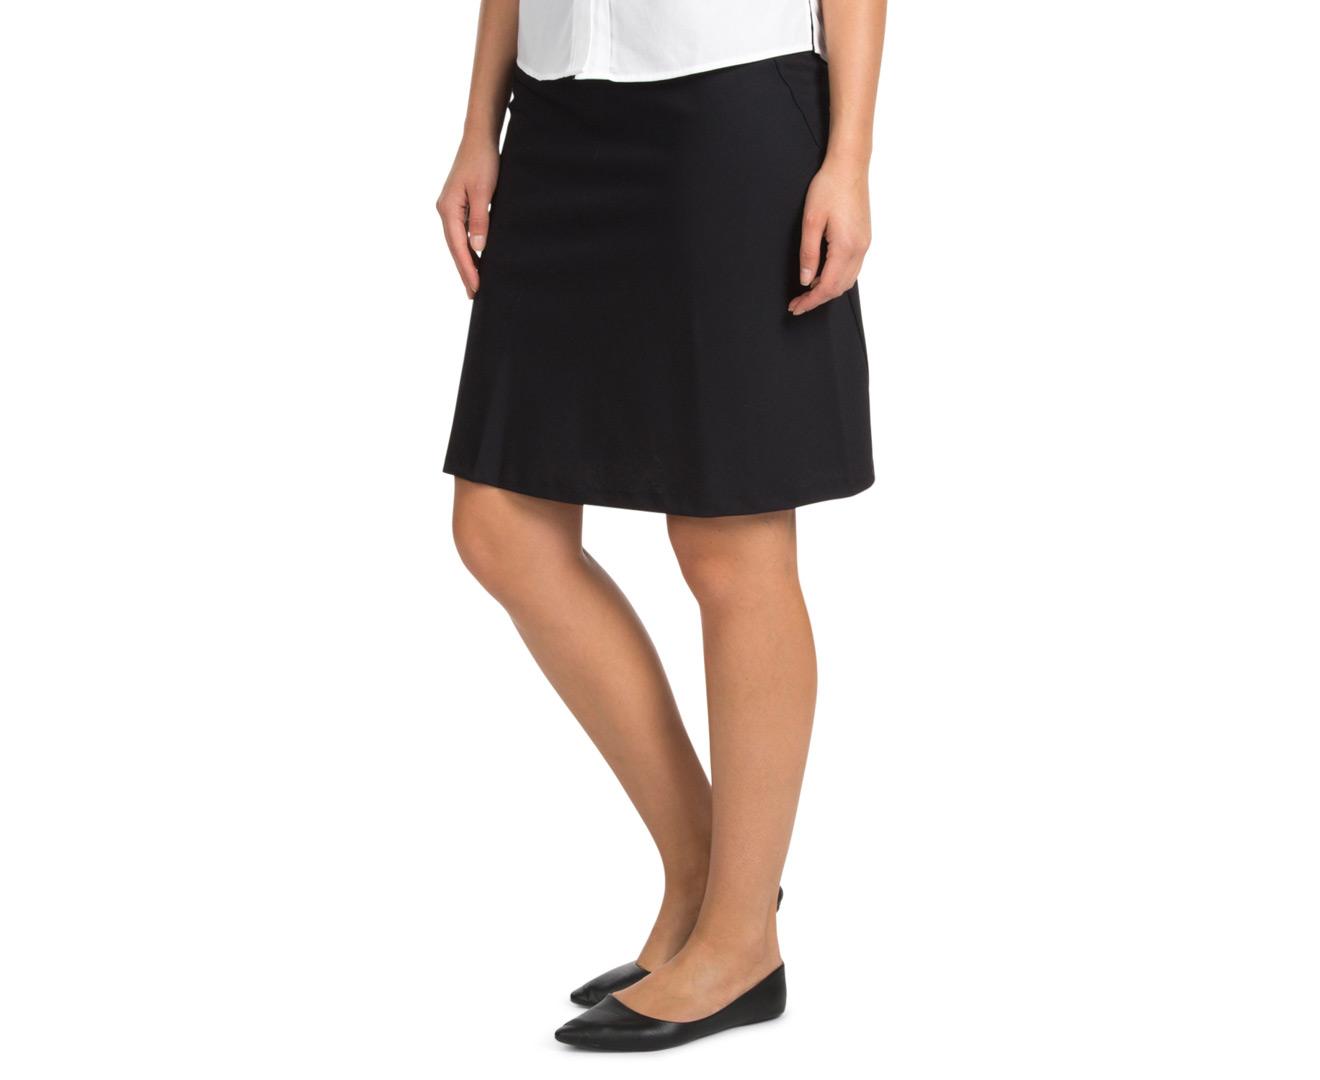 stylecorp s bias cut a line skirt navy ebay